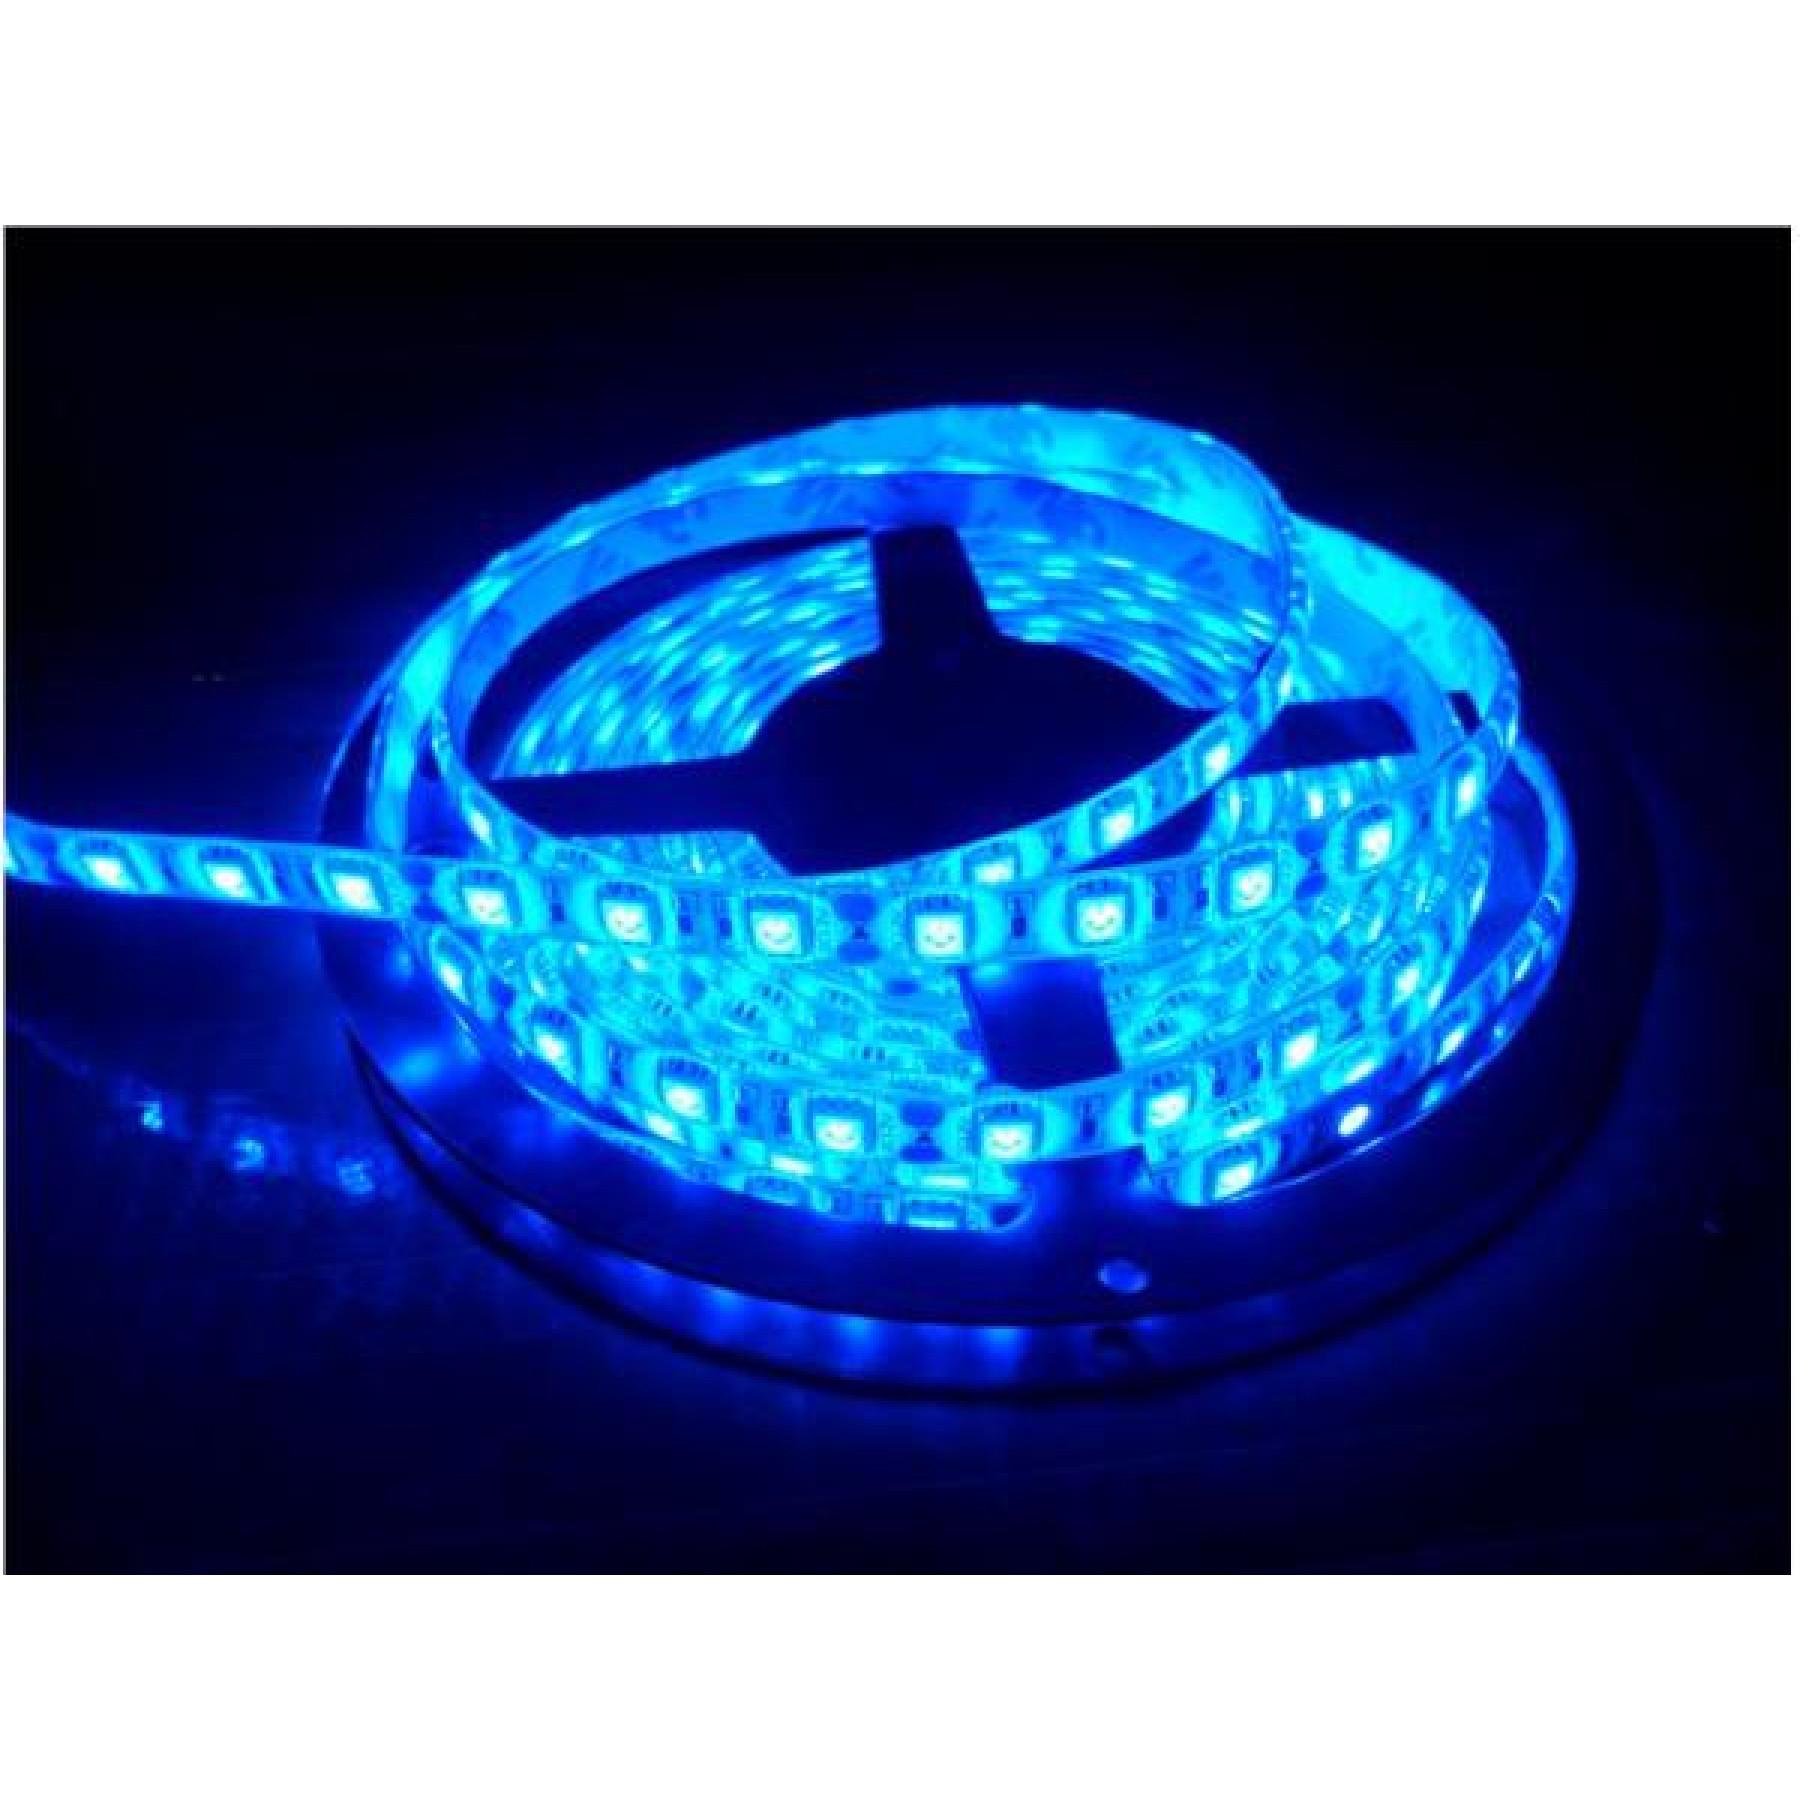 LED strip 4,8W 60LEDs/m Blauw 5m 12V